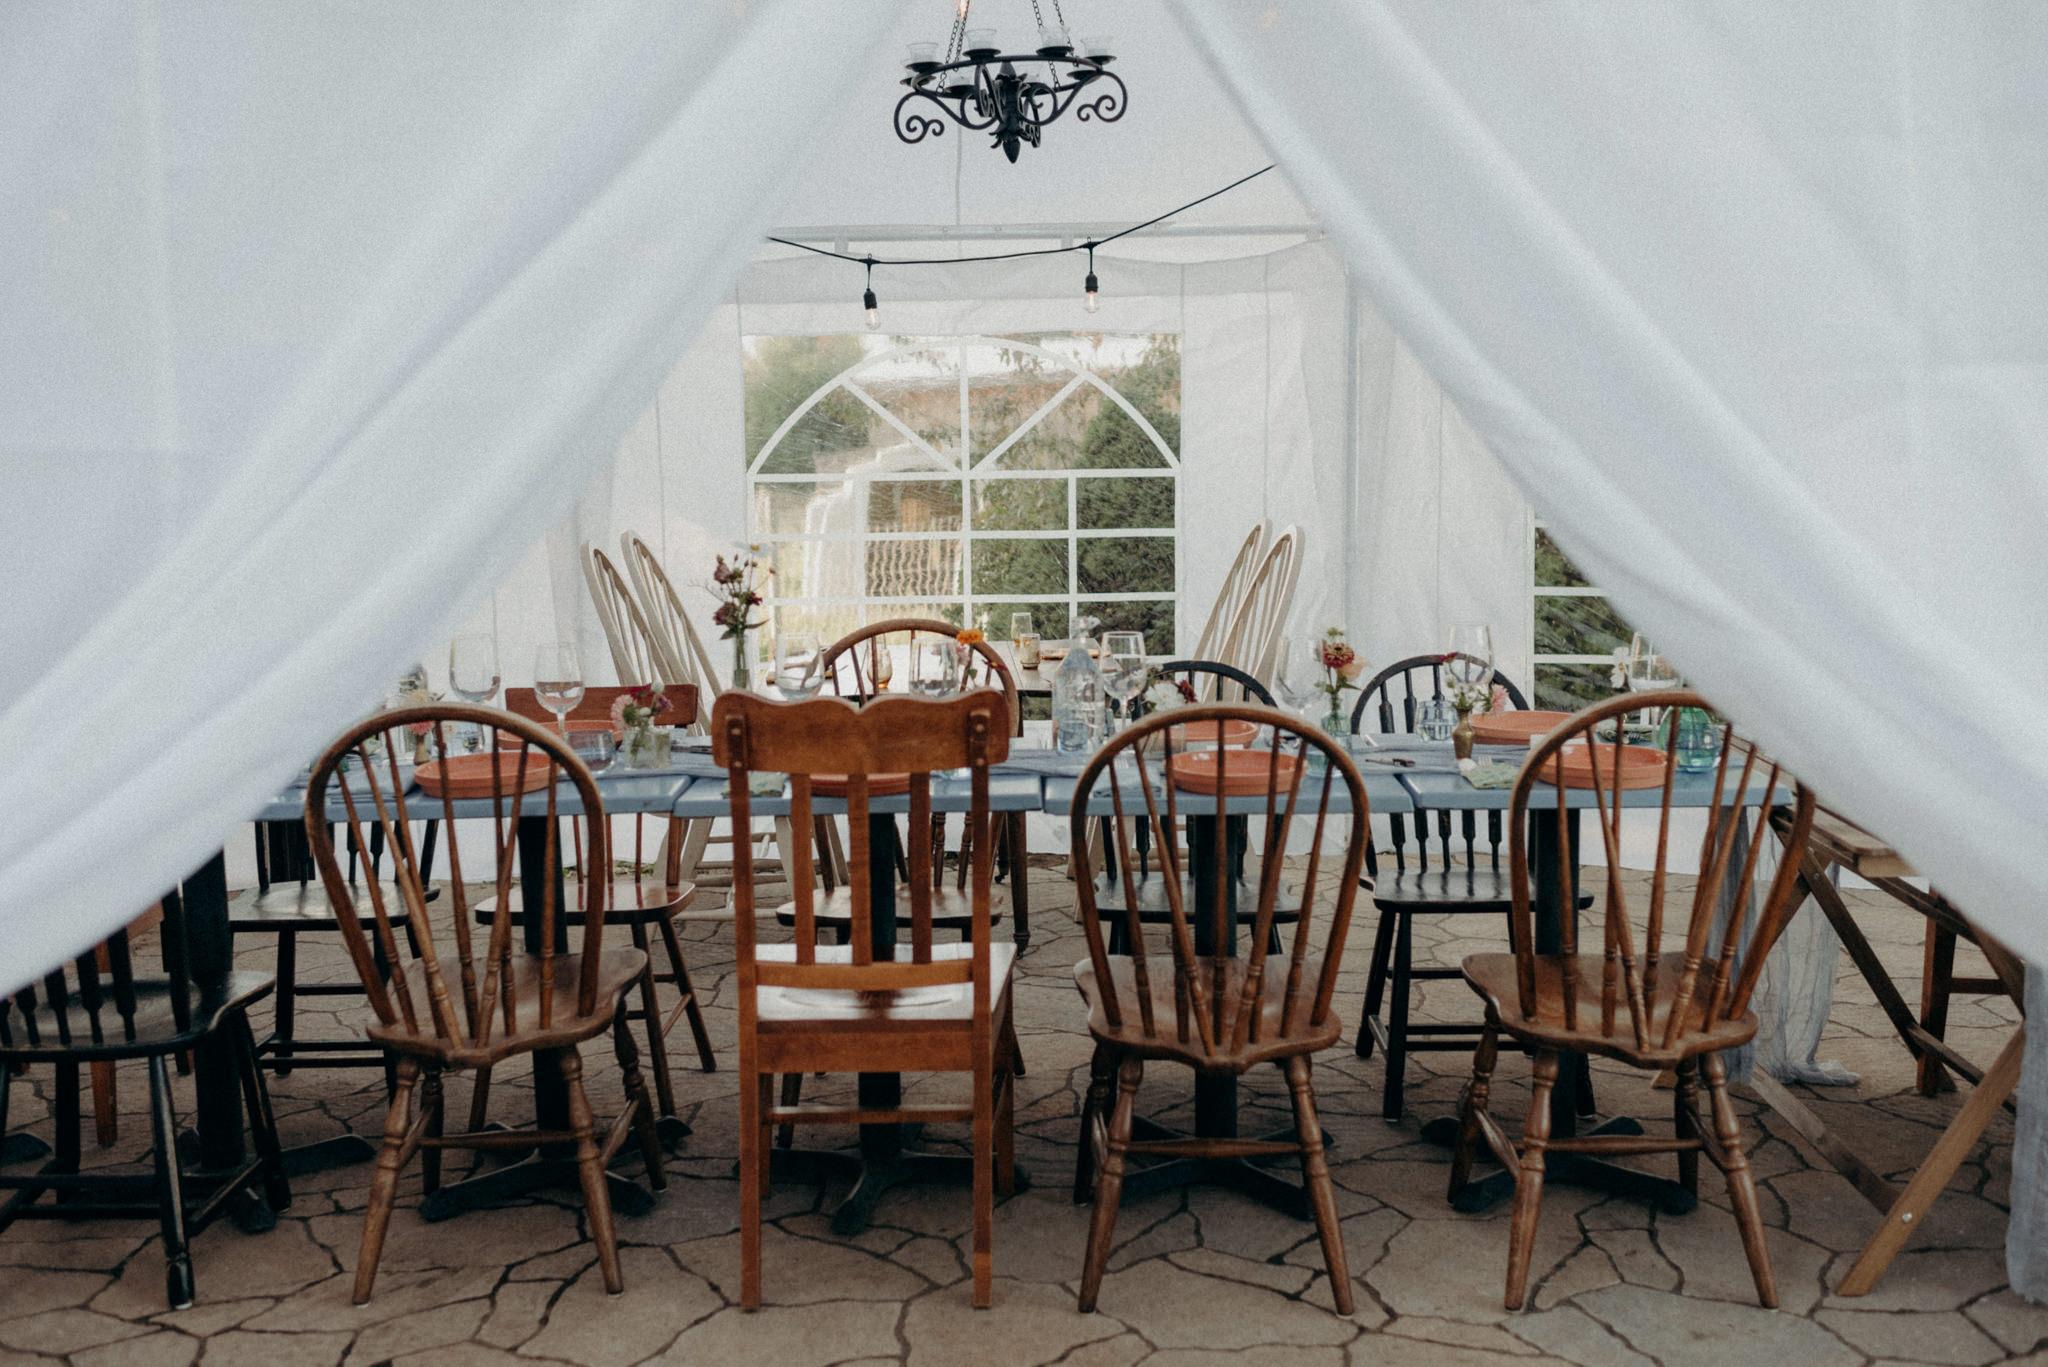 Intimate tent reception, intimate wedding. Good Family Farms Wedding.